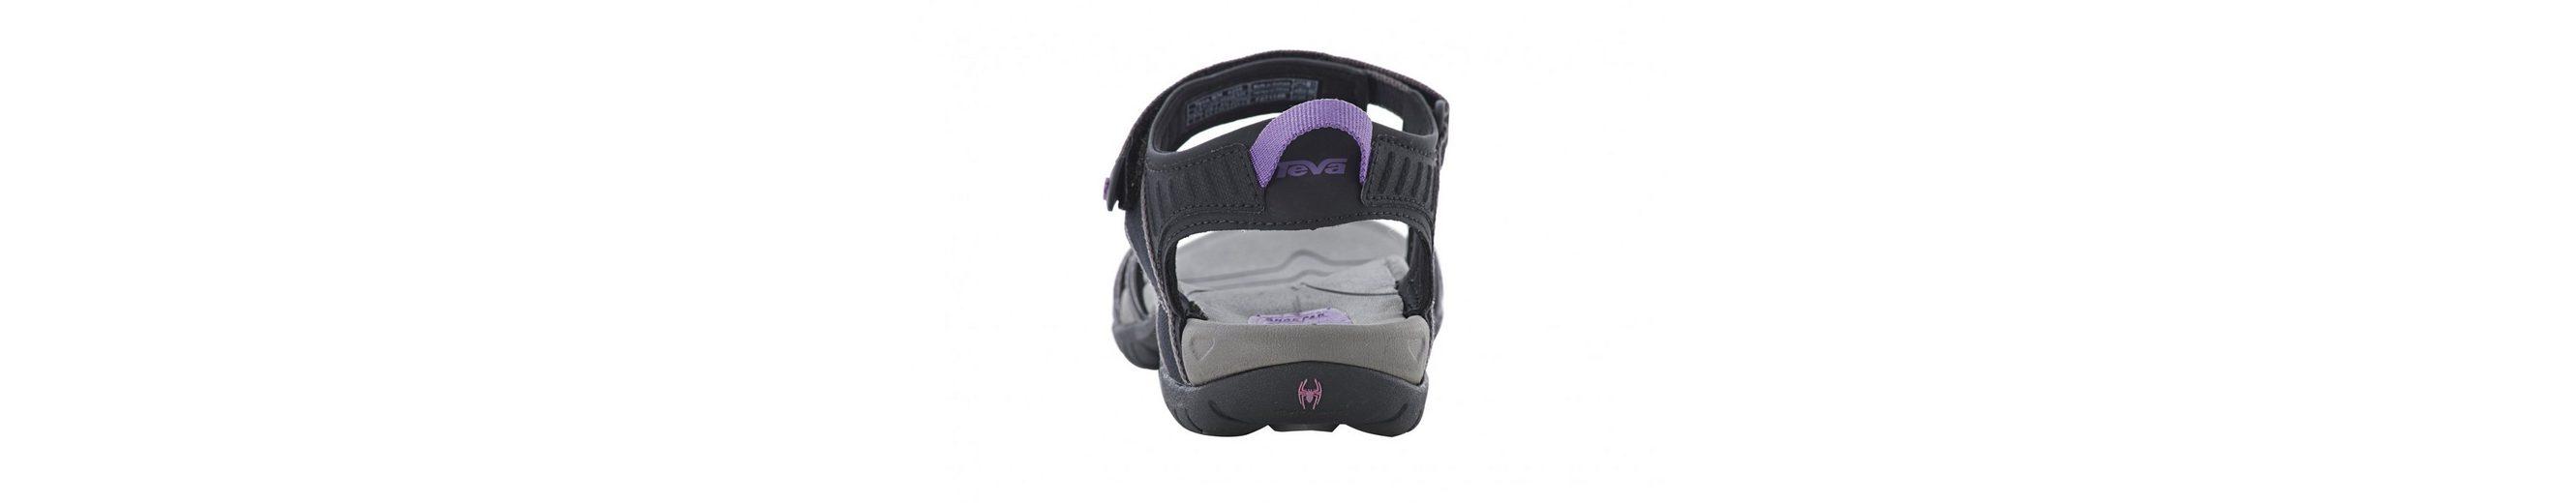 Billig Verkauf Fabrikverkauf Verkauf Billig Teva Sandale Tirra Sandals Women Günstig Für Schön Günstiger Versand Marktfähig J34G0IGgZ